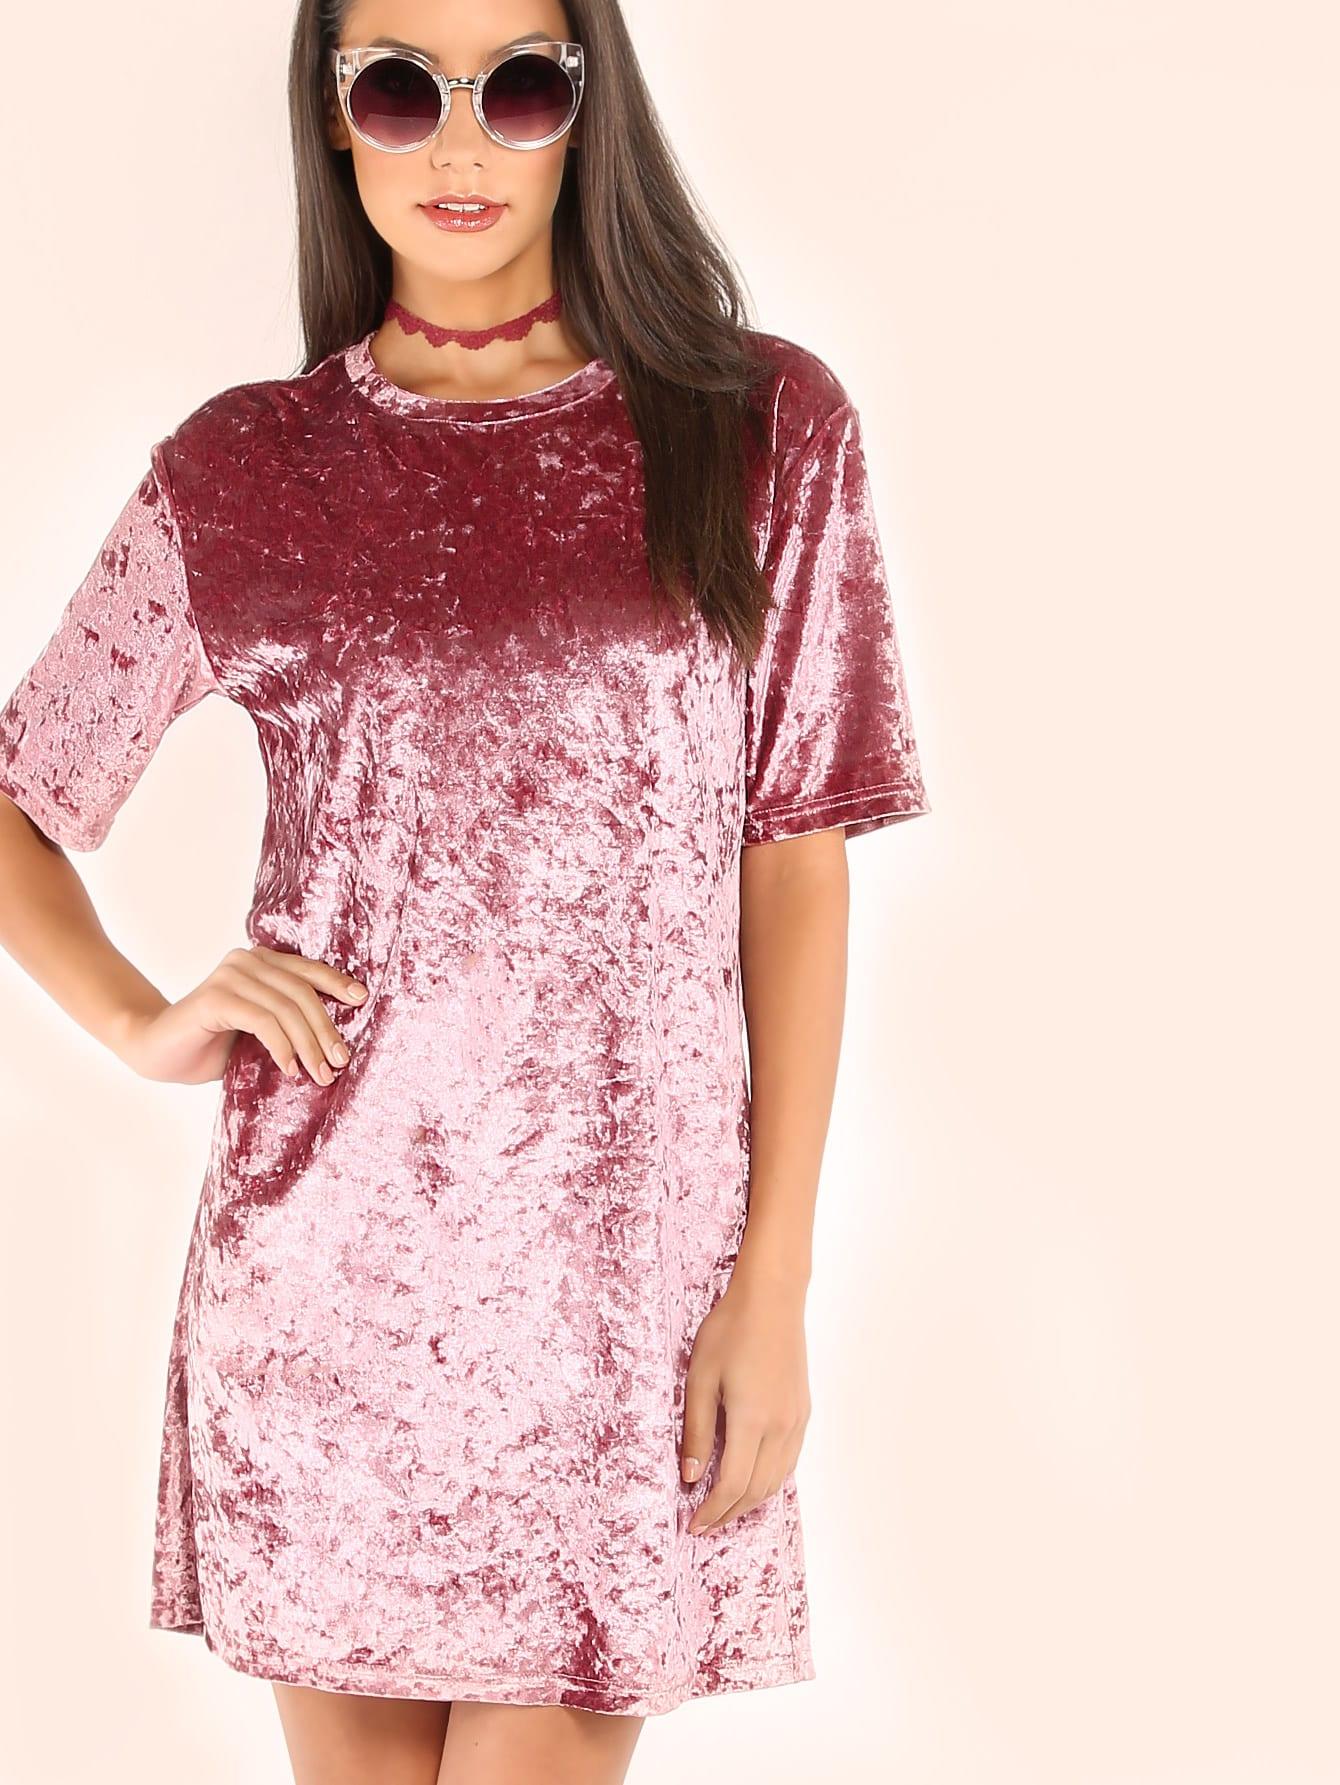 Crushed Velvet T-shirt Dress mini crushed velvet tunic straight shirt dress